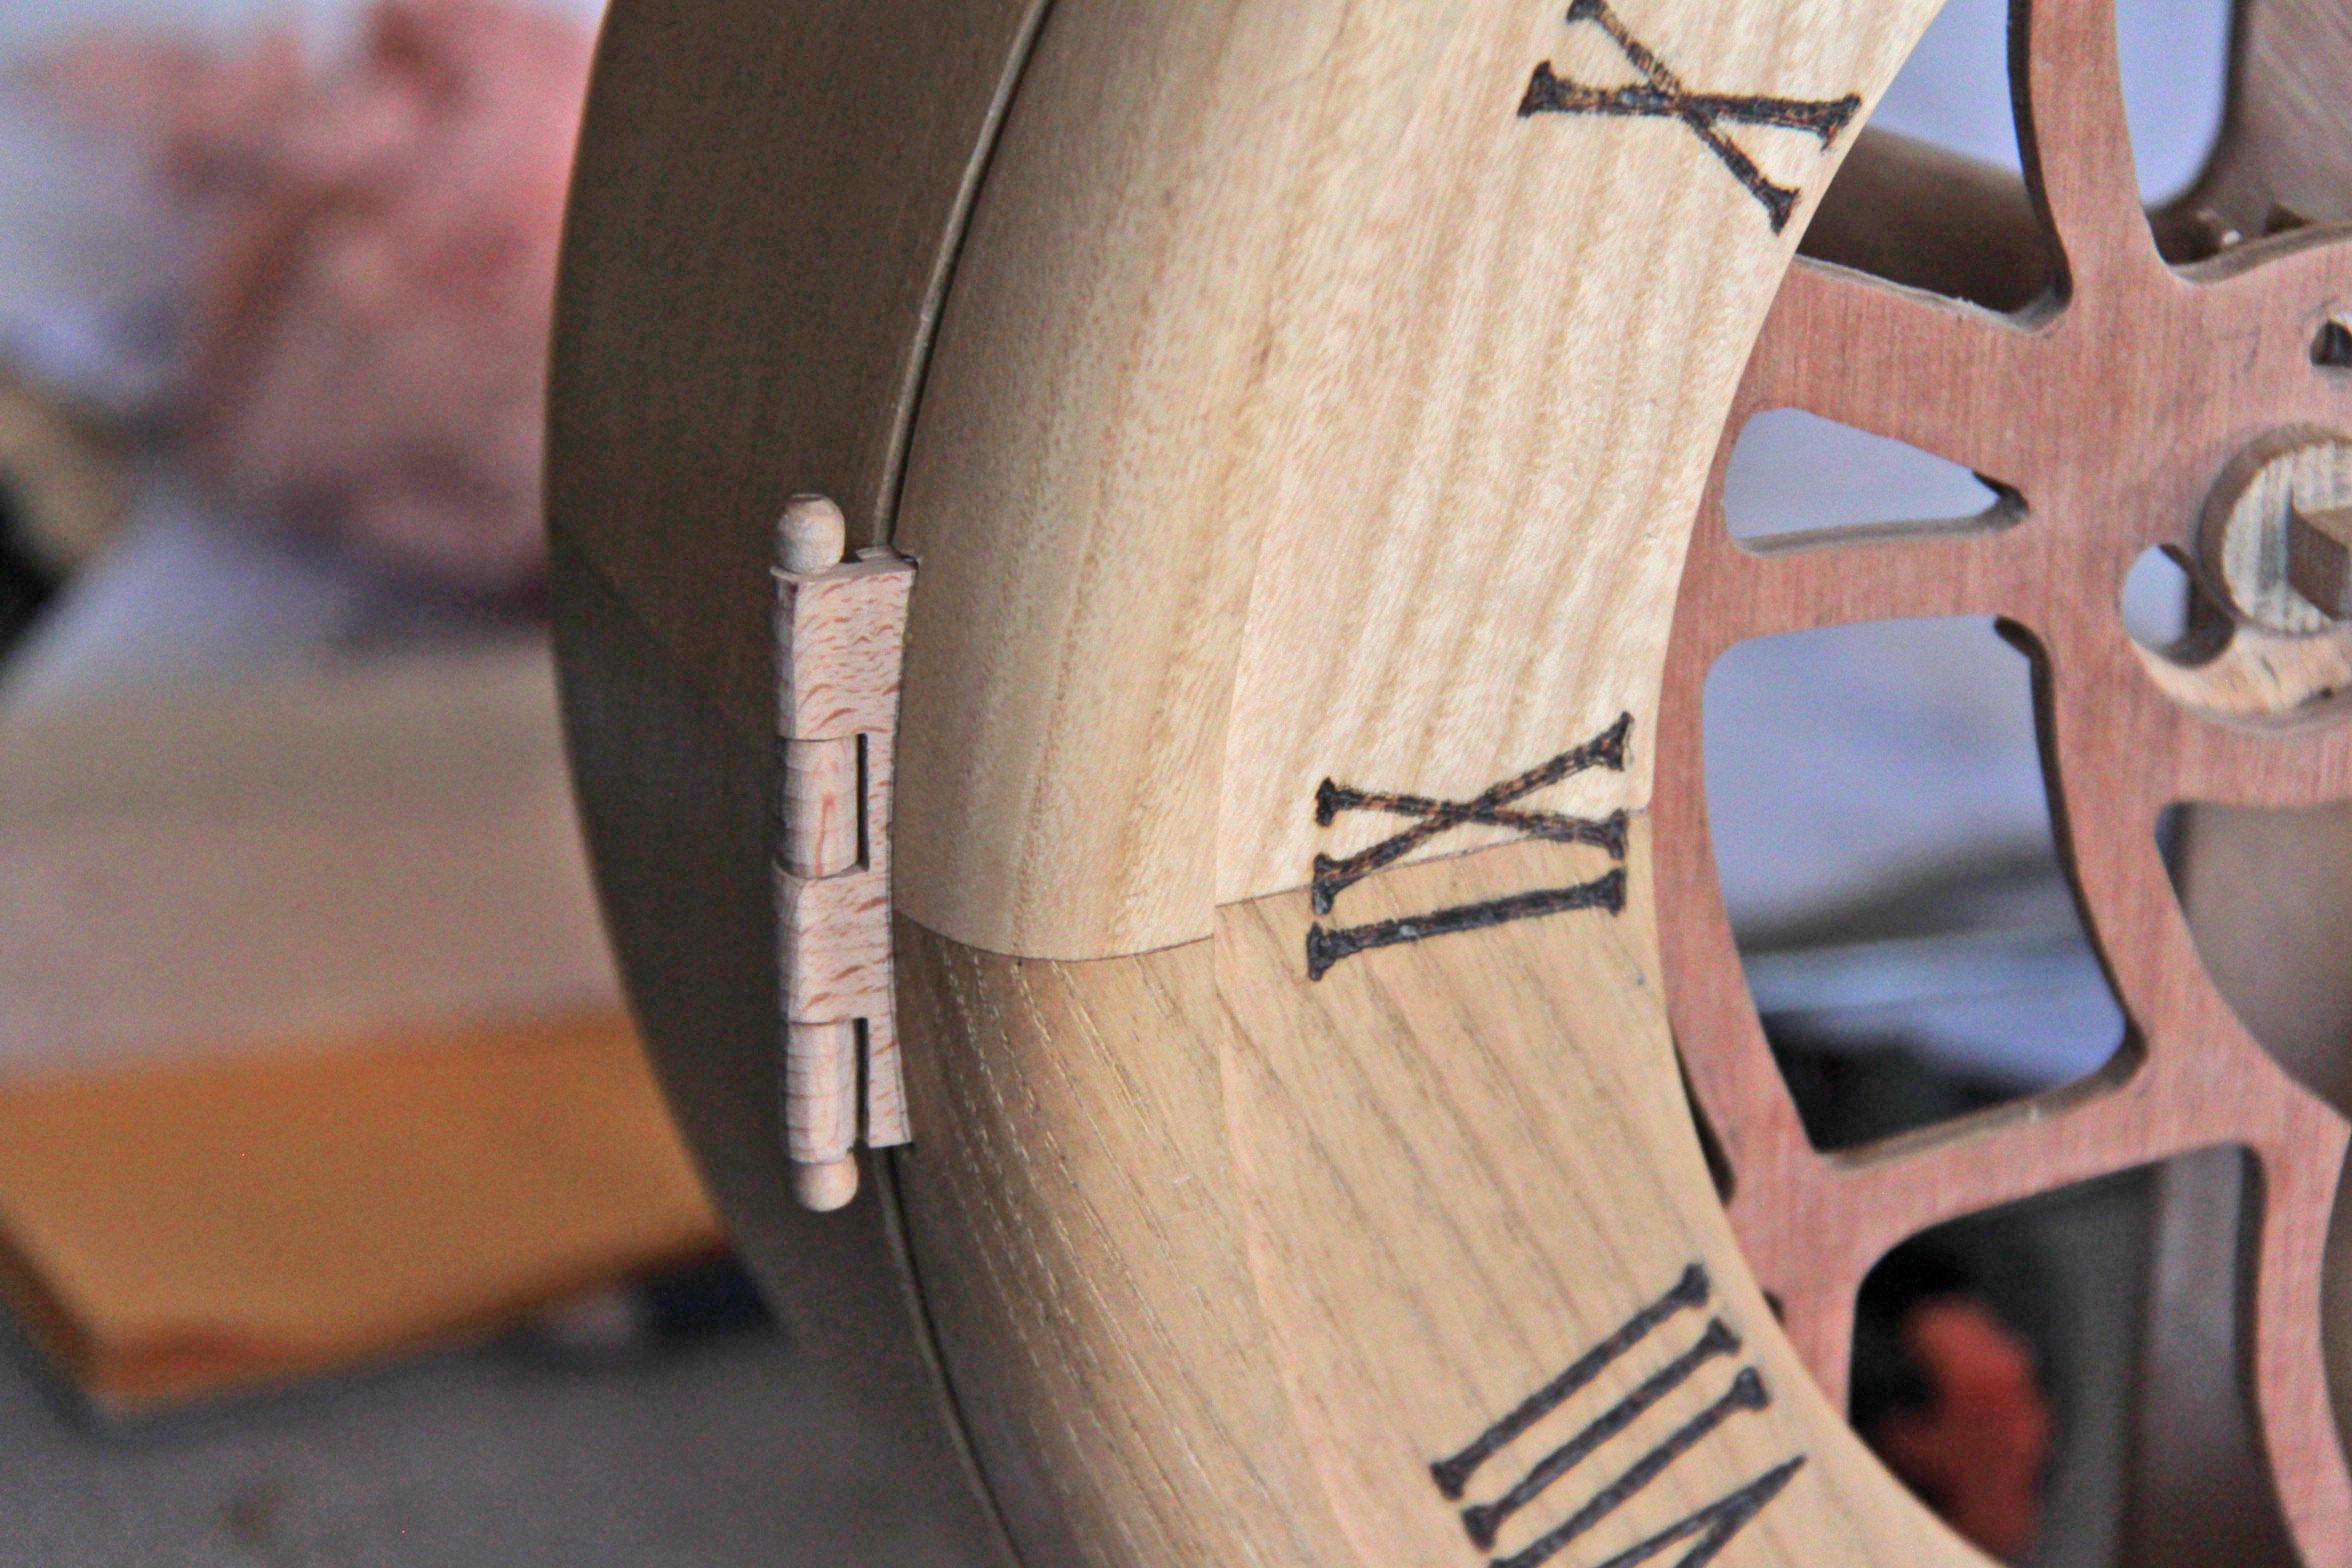 Wooden clock hinge 1.jpg